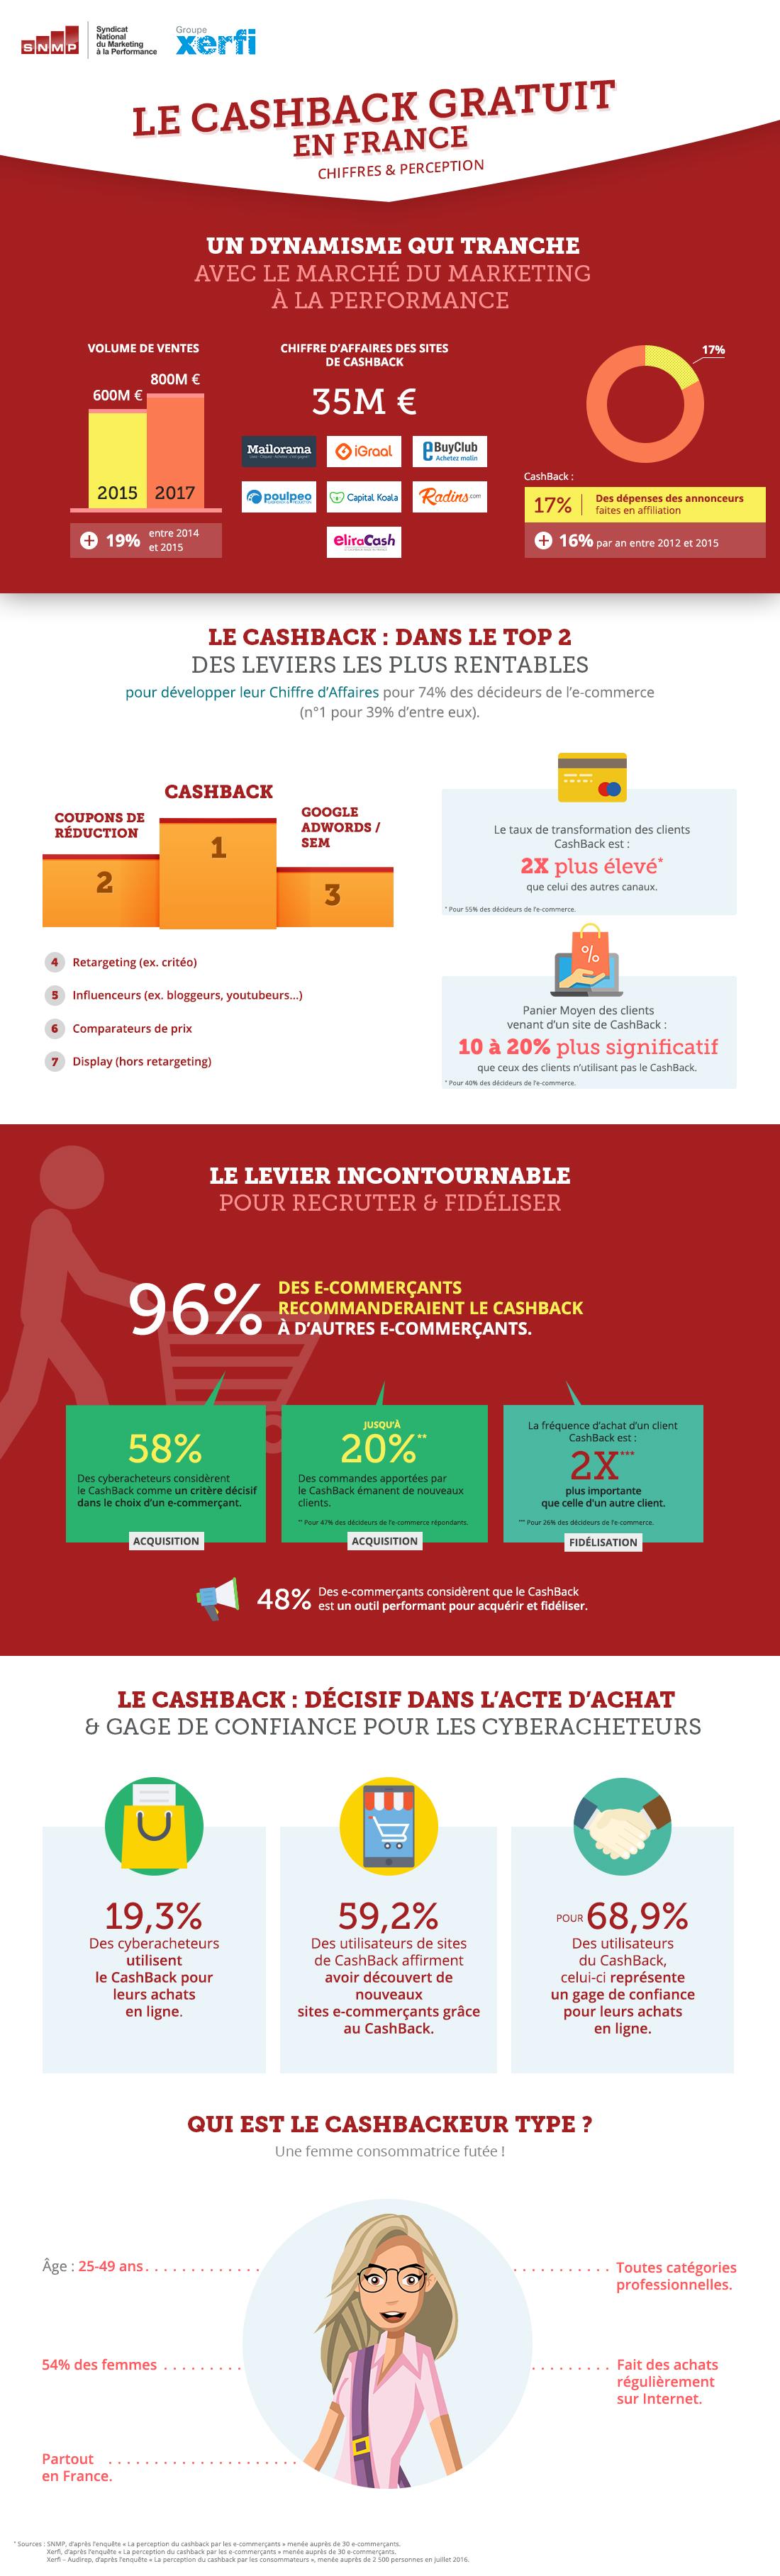 infographie-impact-cashback-statistiques-france